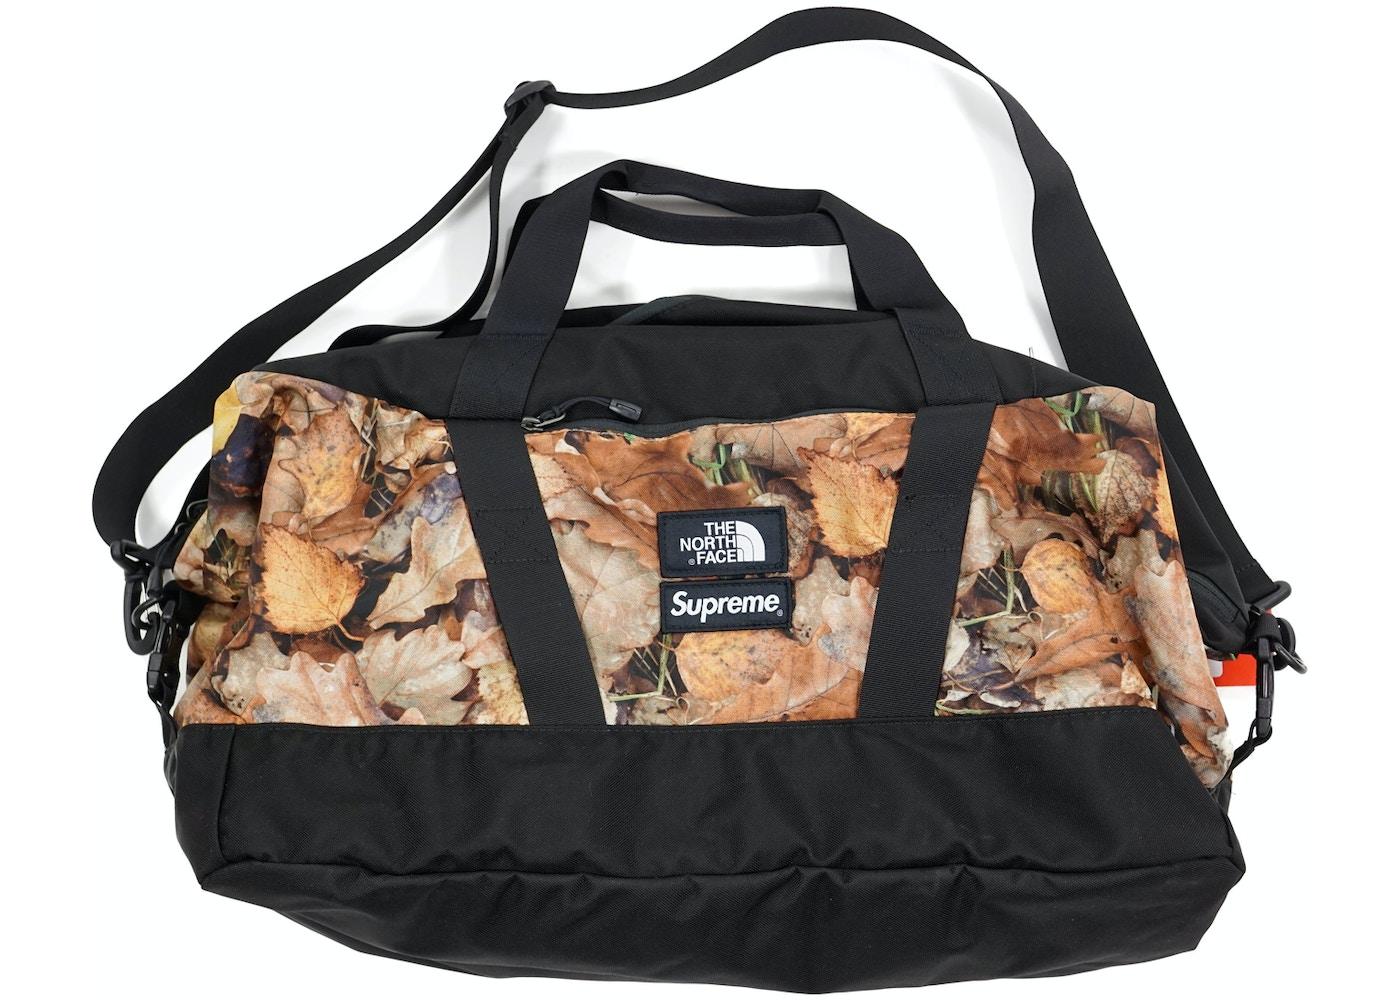 acc3e1bc5 Supreme The North Face Apex Duffle Bag Leaves - FW16